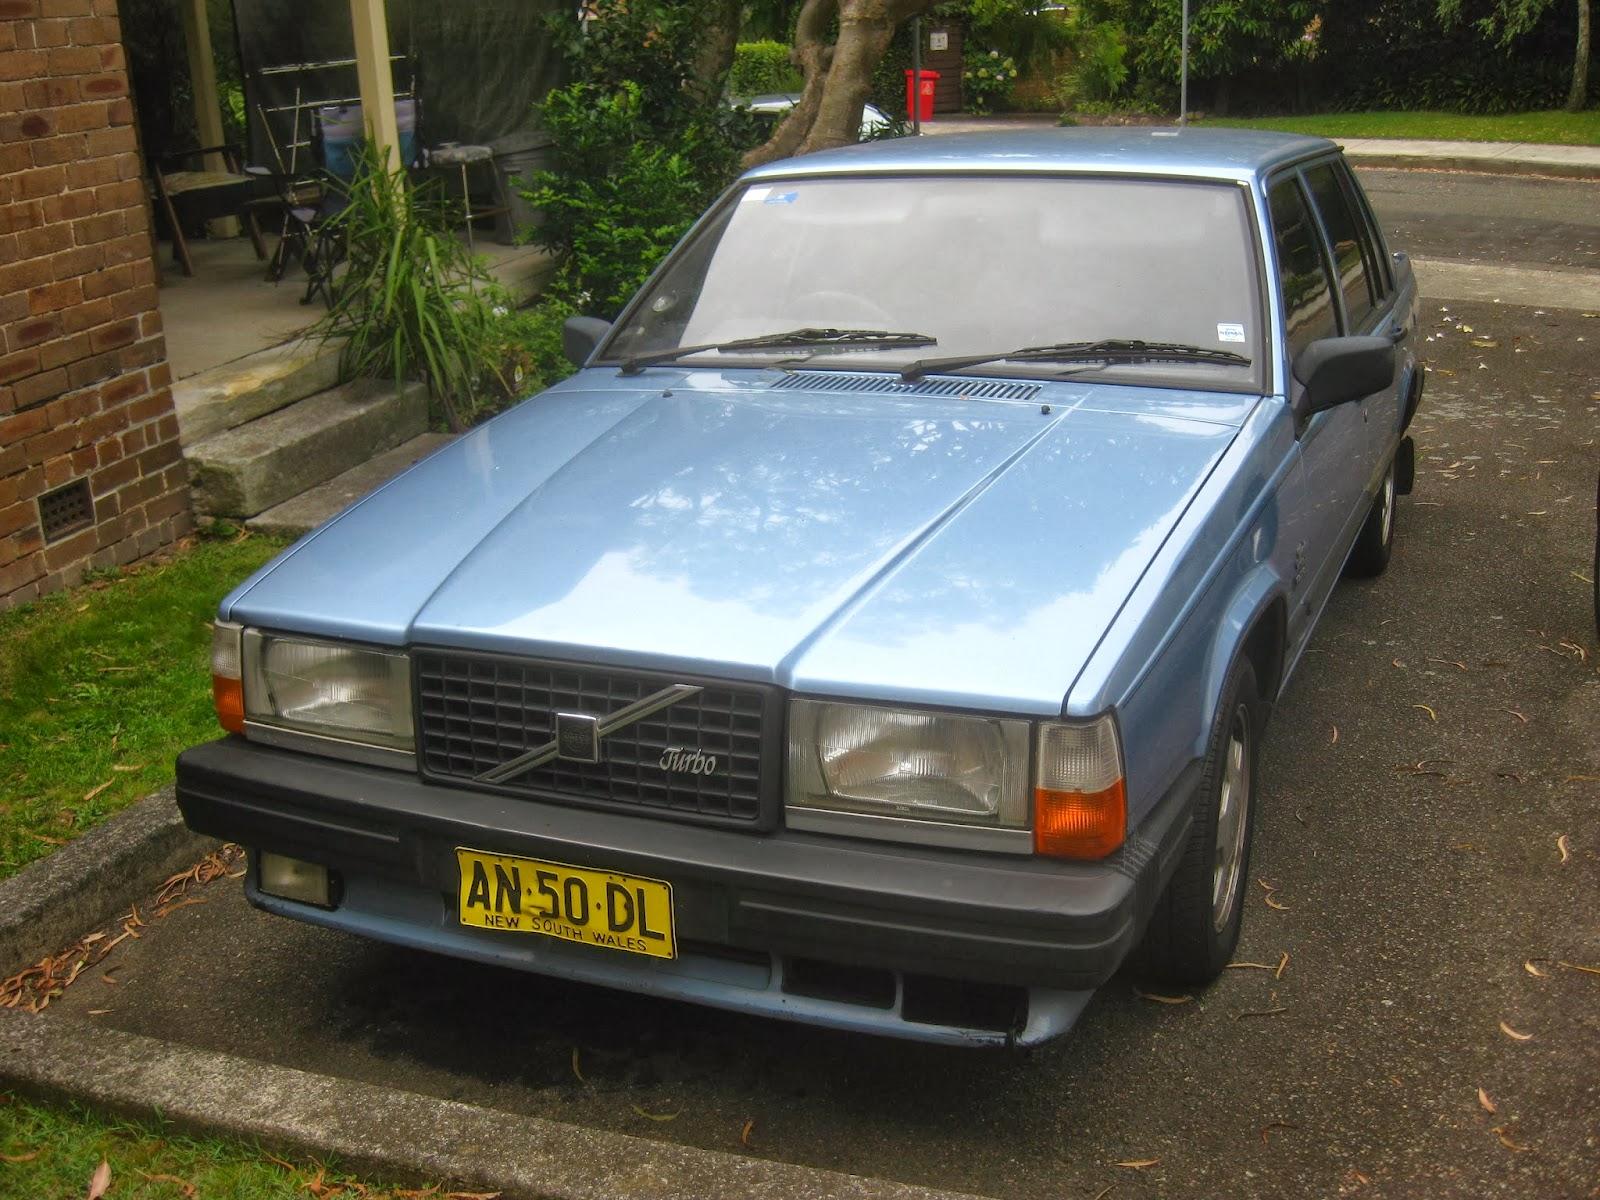 Aussie Old Parked Cars 1987 Volvo 740 Turbo Sedan